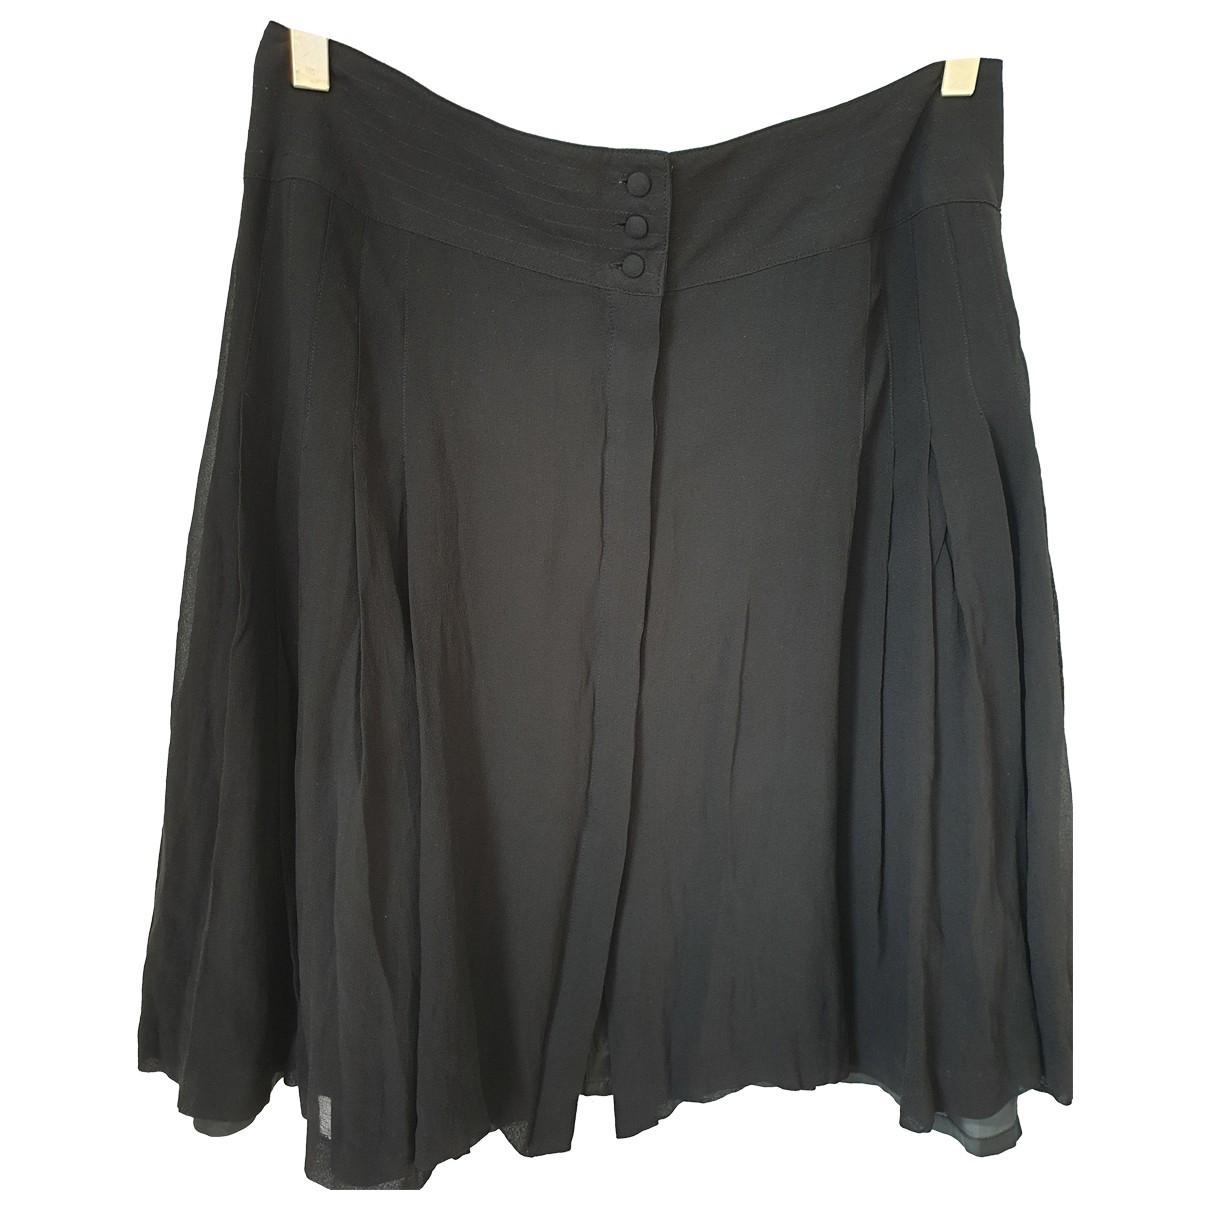 Mini falda de Seda Karl Lagerfeld Pour H&m